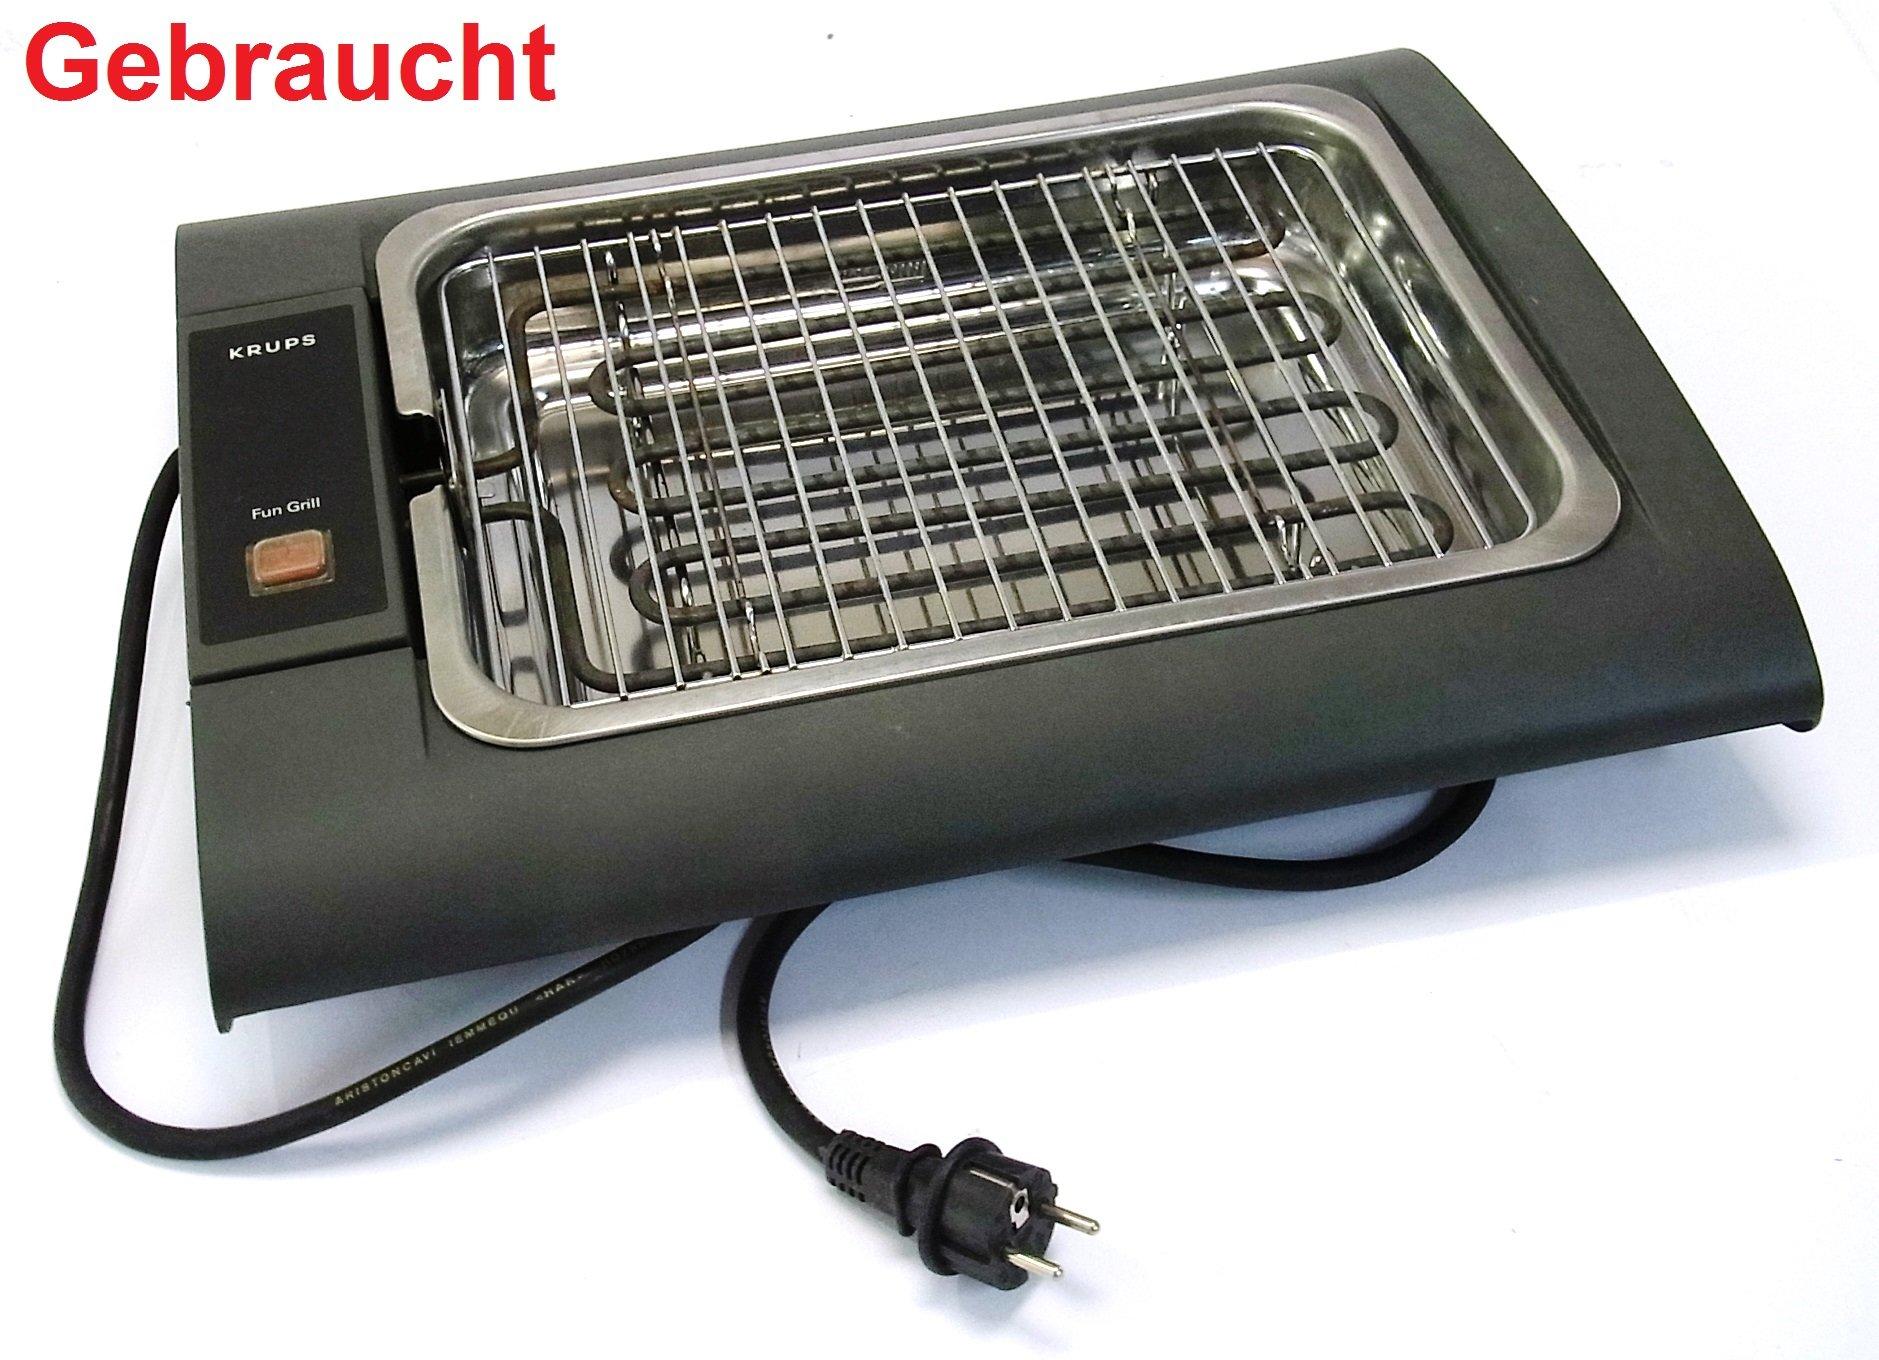 krups fun grill 361 tischgrill elektrisch elektrogrill indoor fun grill 2500 w ebay. Black Bedroom Furniture Sets. Home Design Ideas